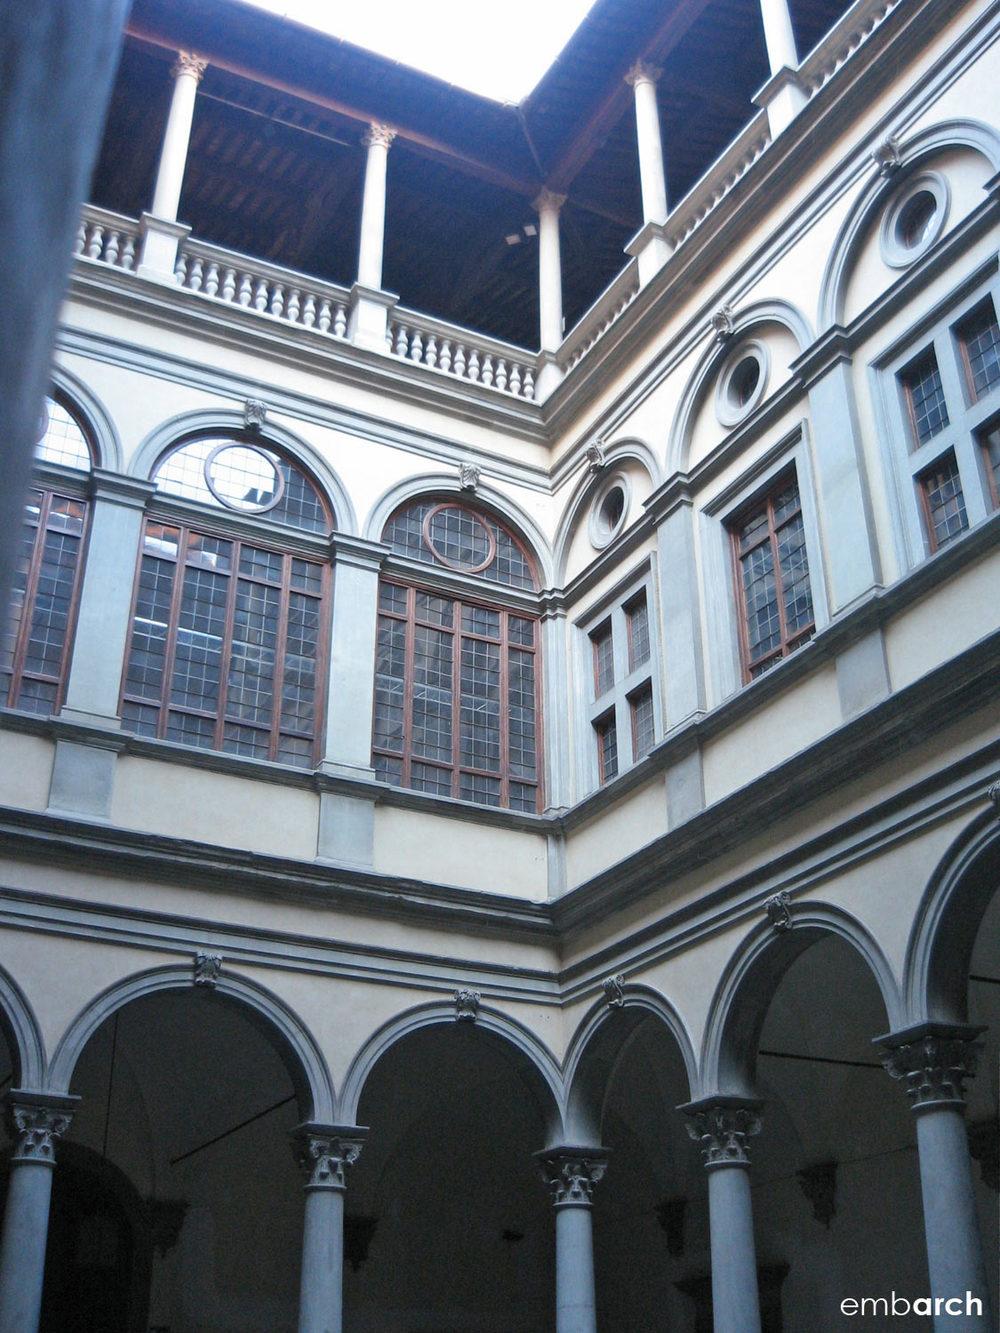 Palazzo Strozzi - interior courtyard